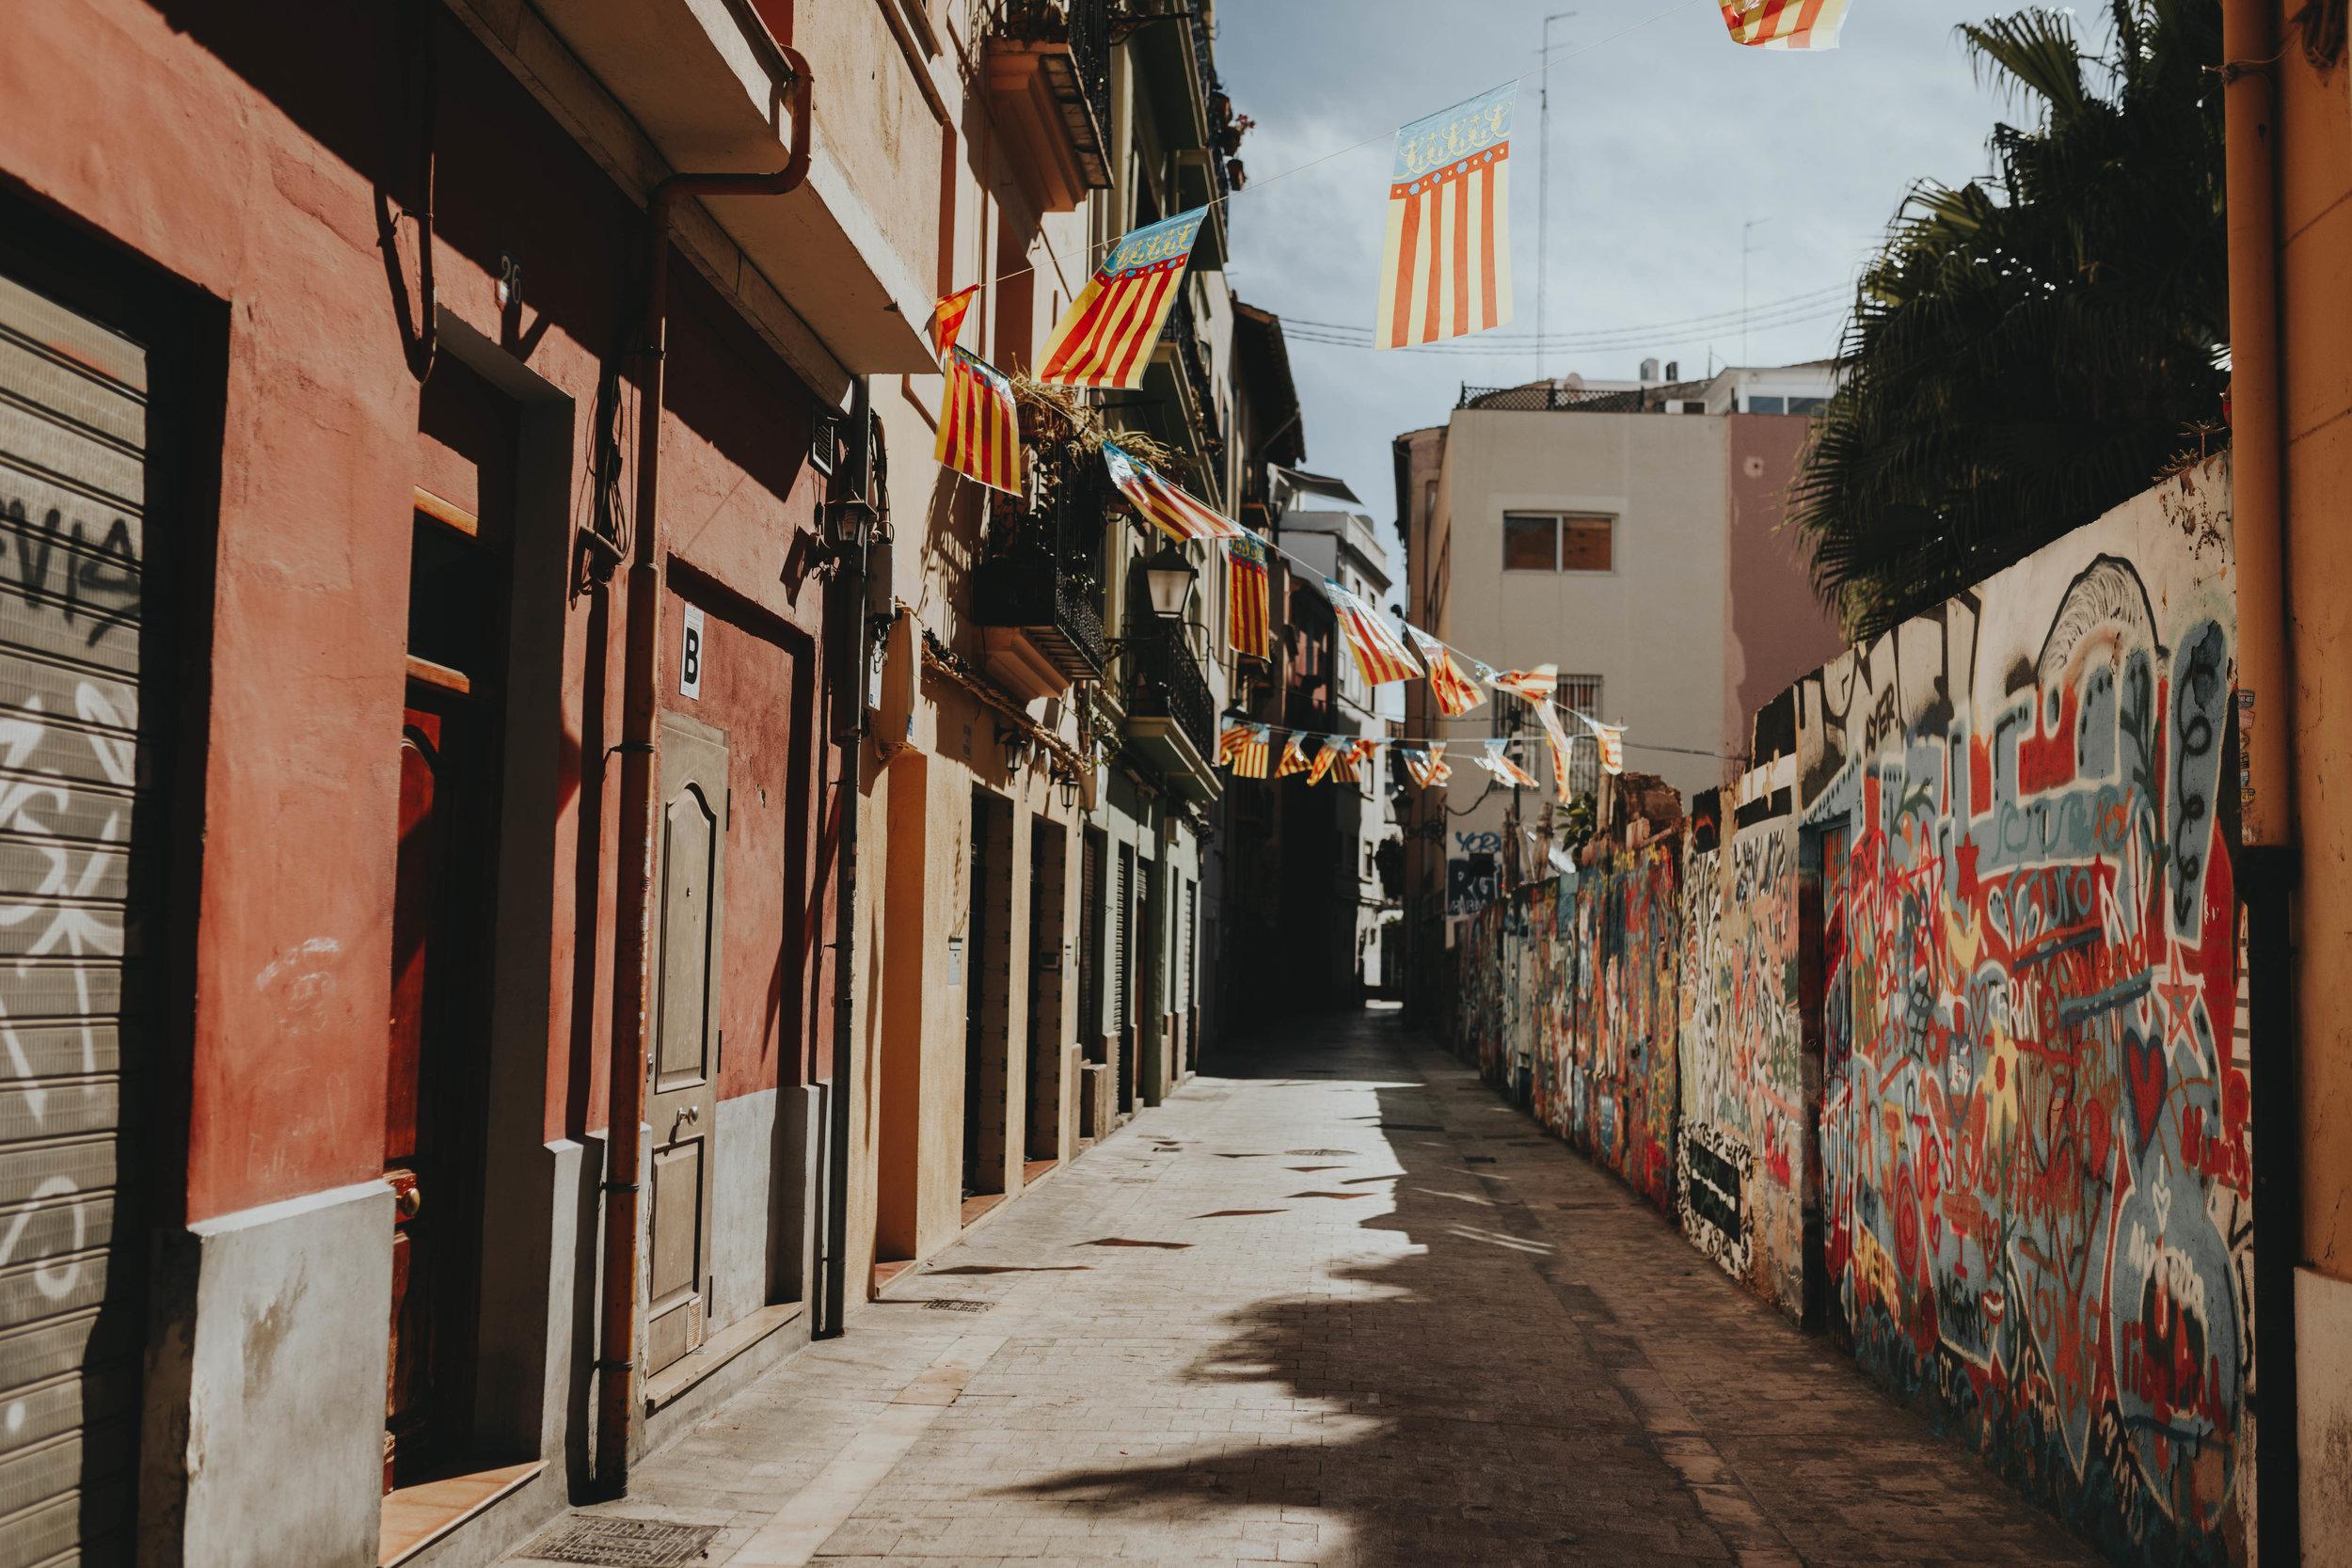 art graffiti tour in valencia spain - best weekend trips from Barcelona by Emily Anne Photo Art Photographer portrait & Wedding